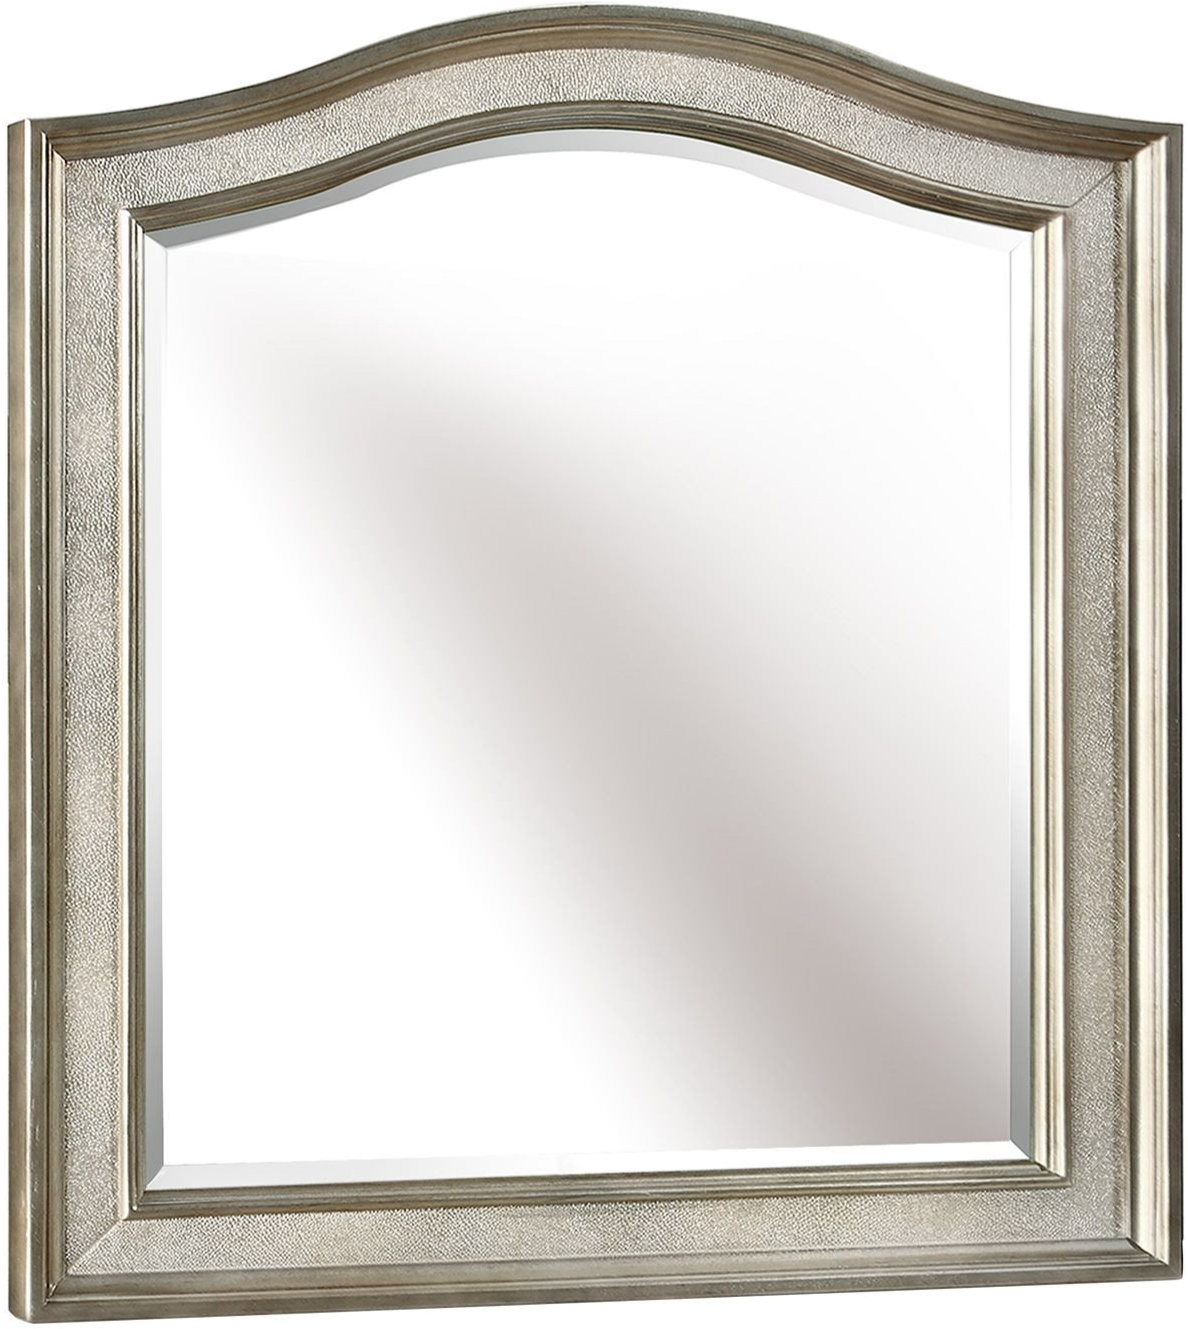 Vanity Mirror Png Transparent Background Coa Inc.